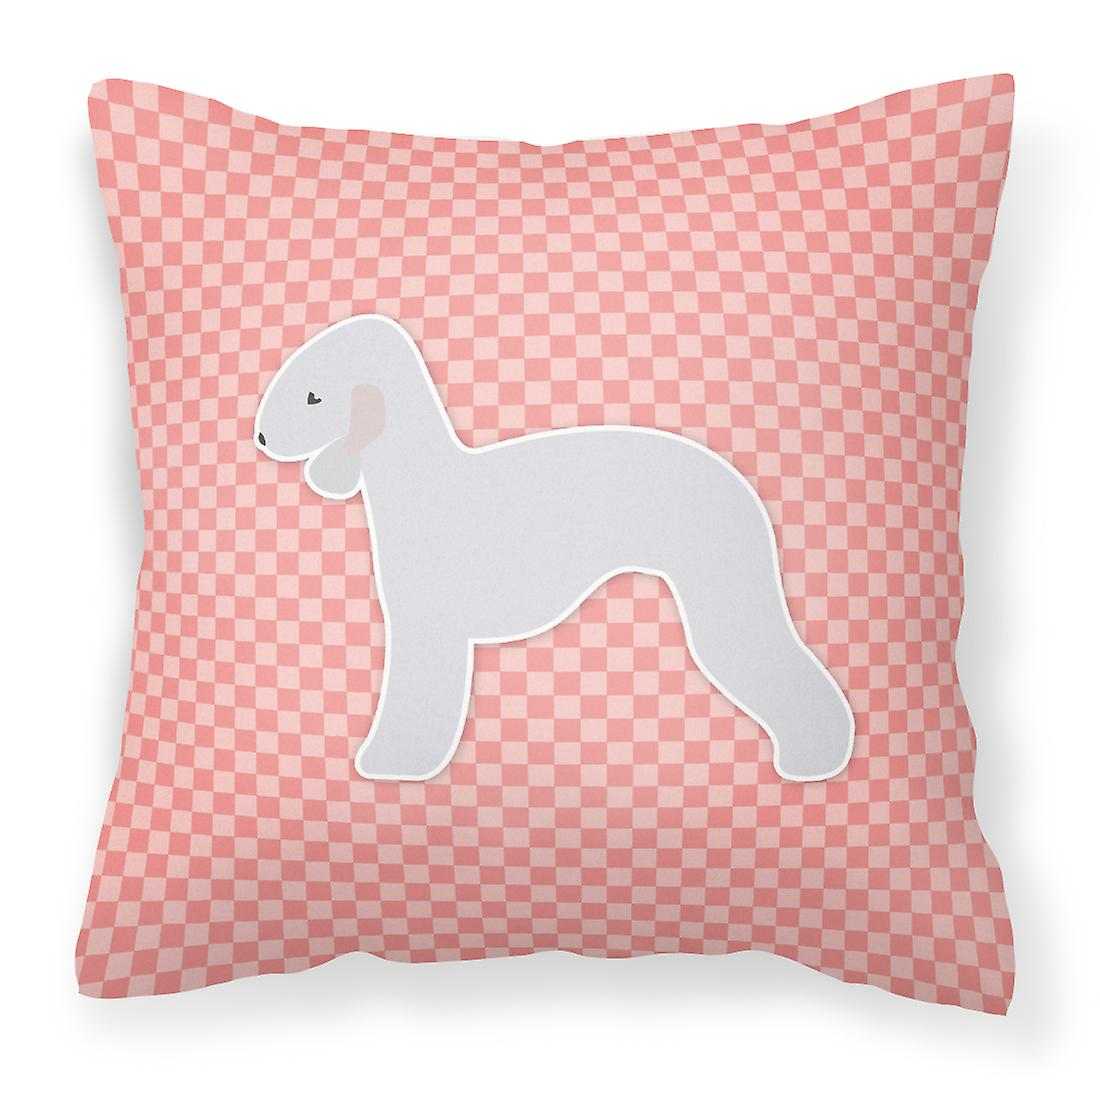 Bedlington Oreiller Rose Décoratif Tissu Damier Terrier W29DEHI